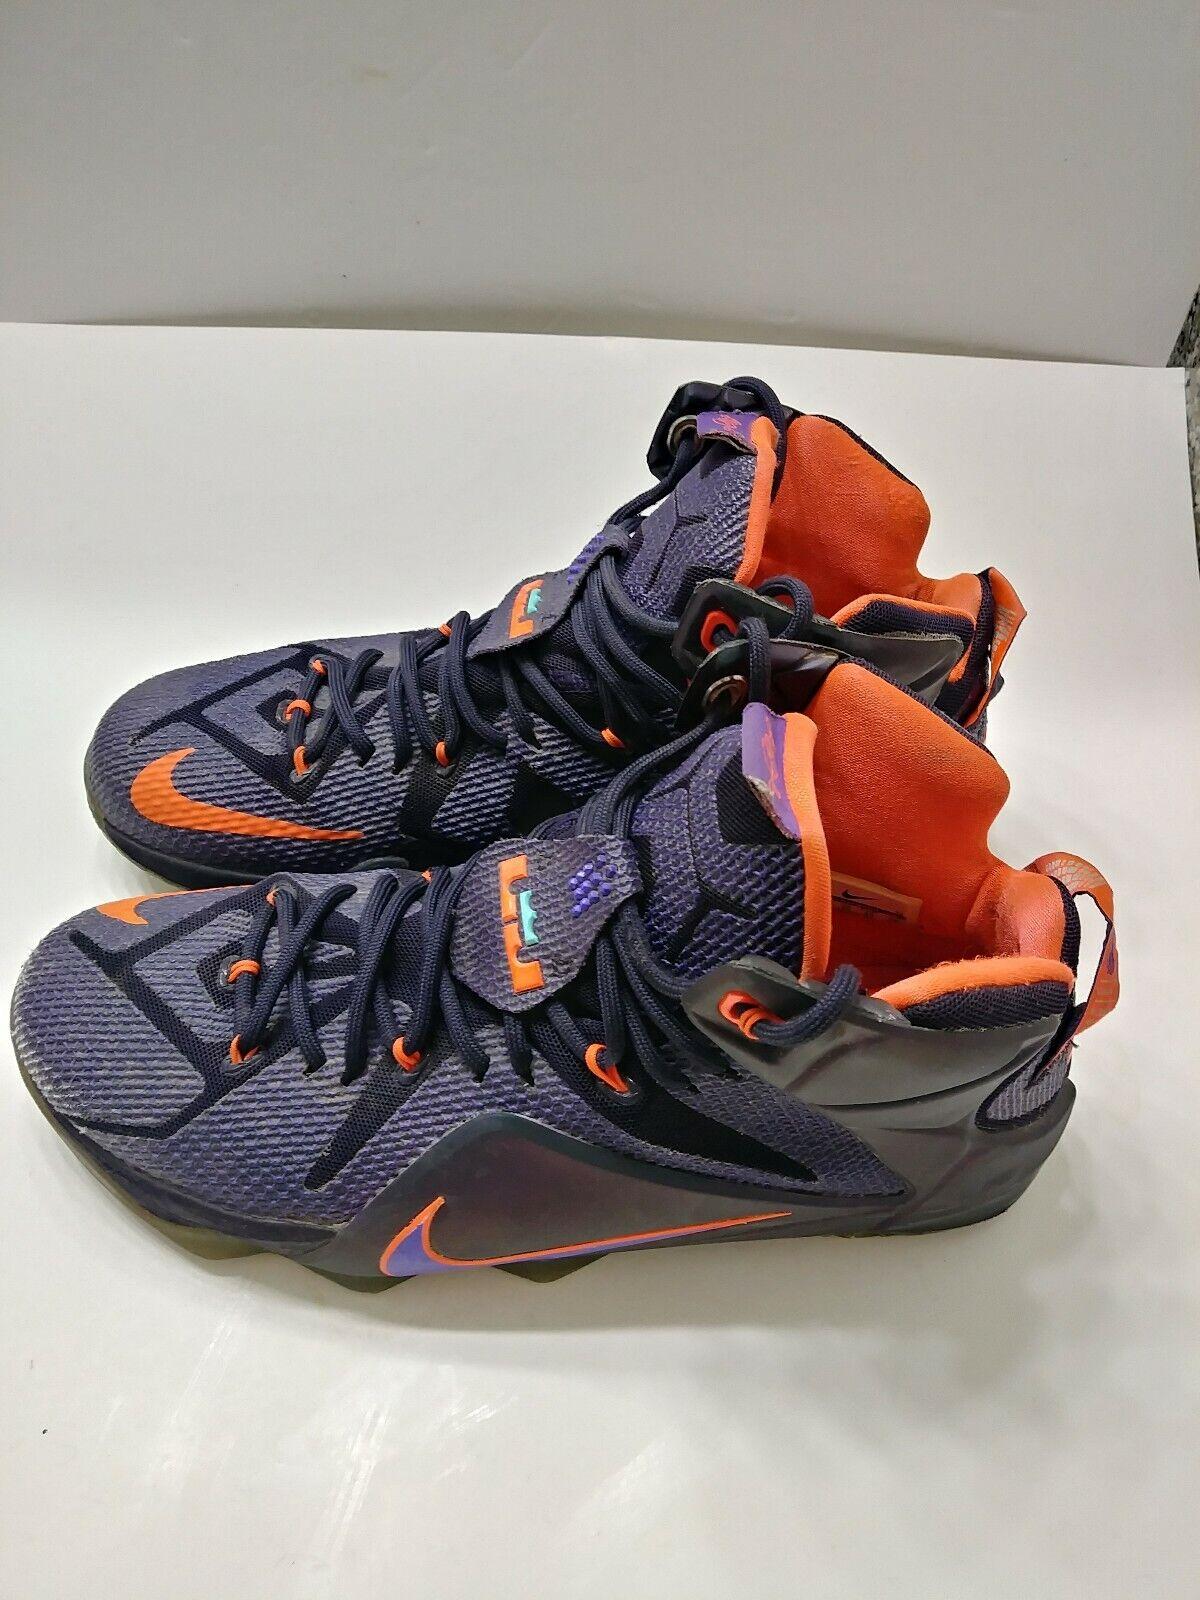 buy popular a4a29 06a1c Nike Lebron James XII Purple Instinct Men's Size 11 Basketball Shoes  684593-583